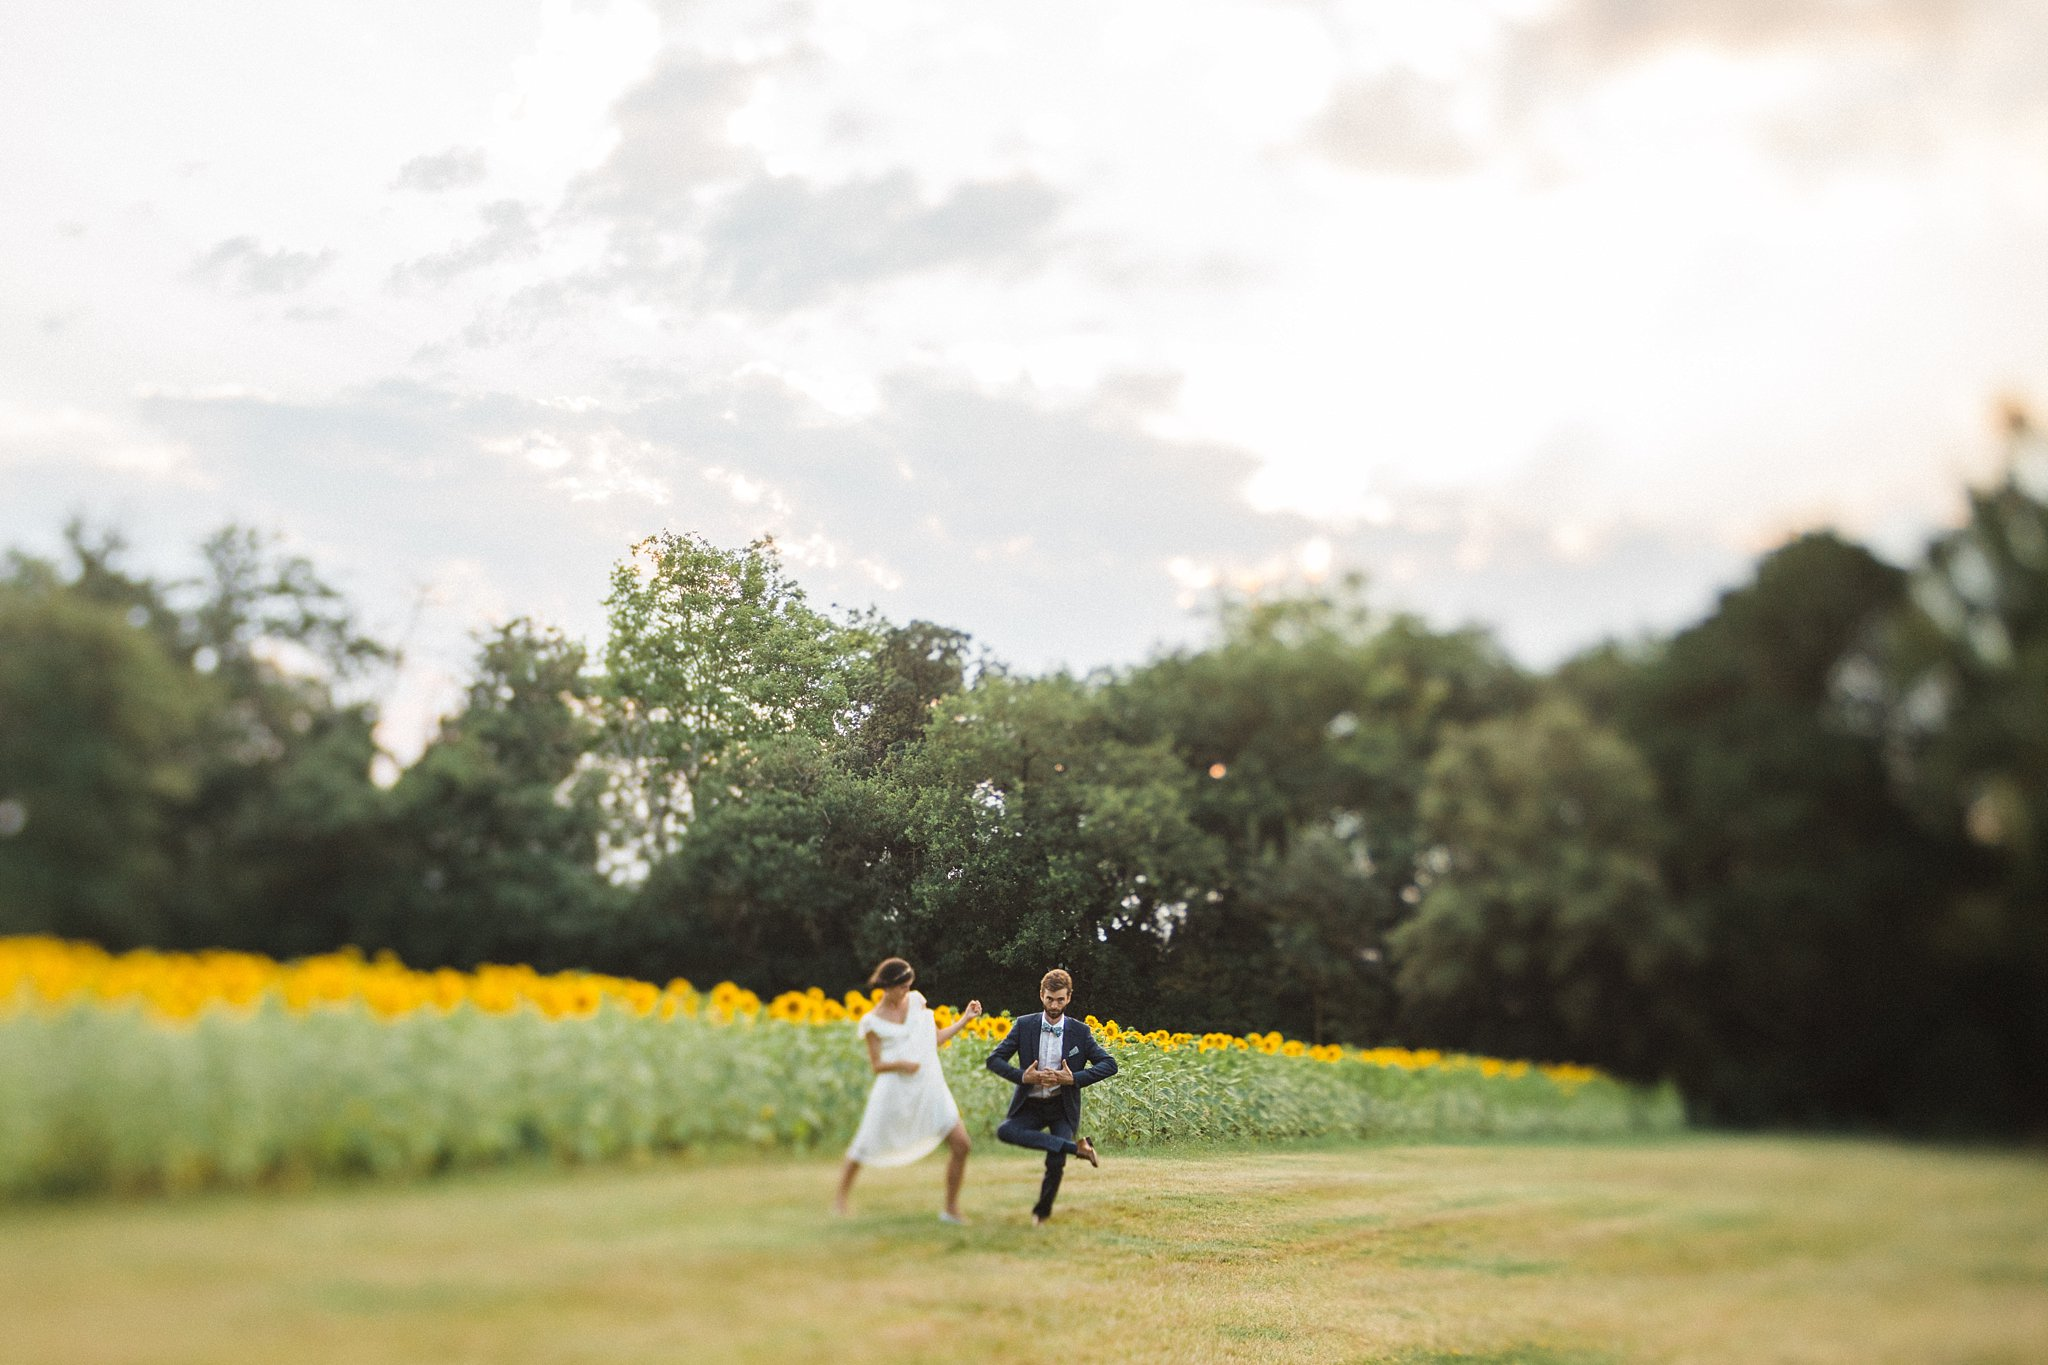 Mariage-a-la-maison-secall-hugo-hennequin-photographe-mariage-perpignan_0100.jpg